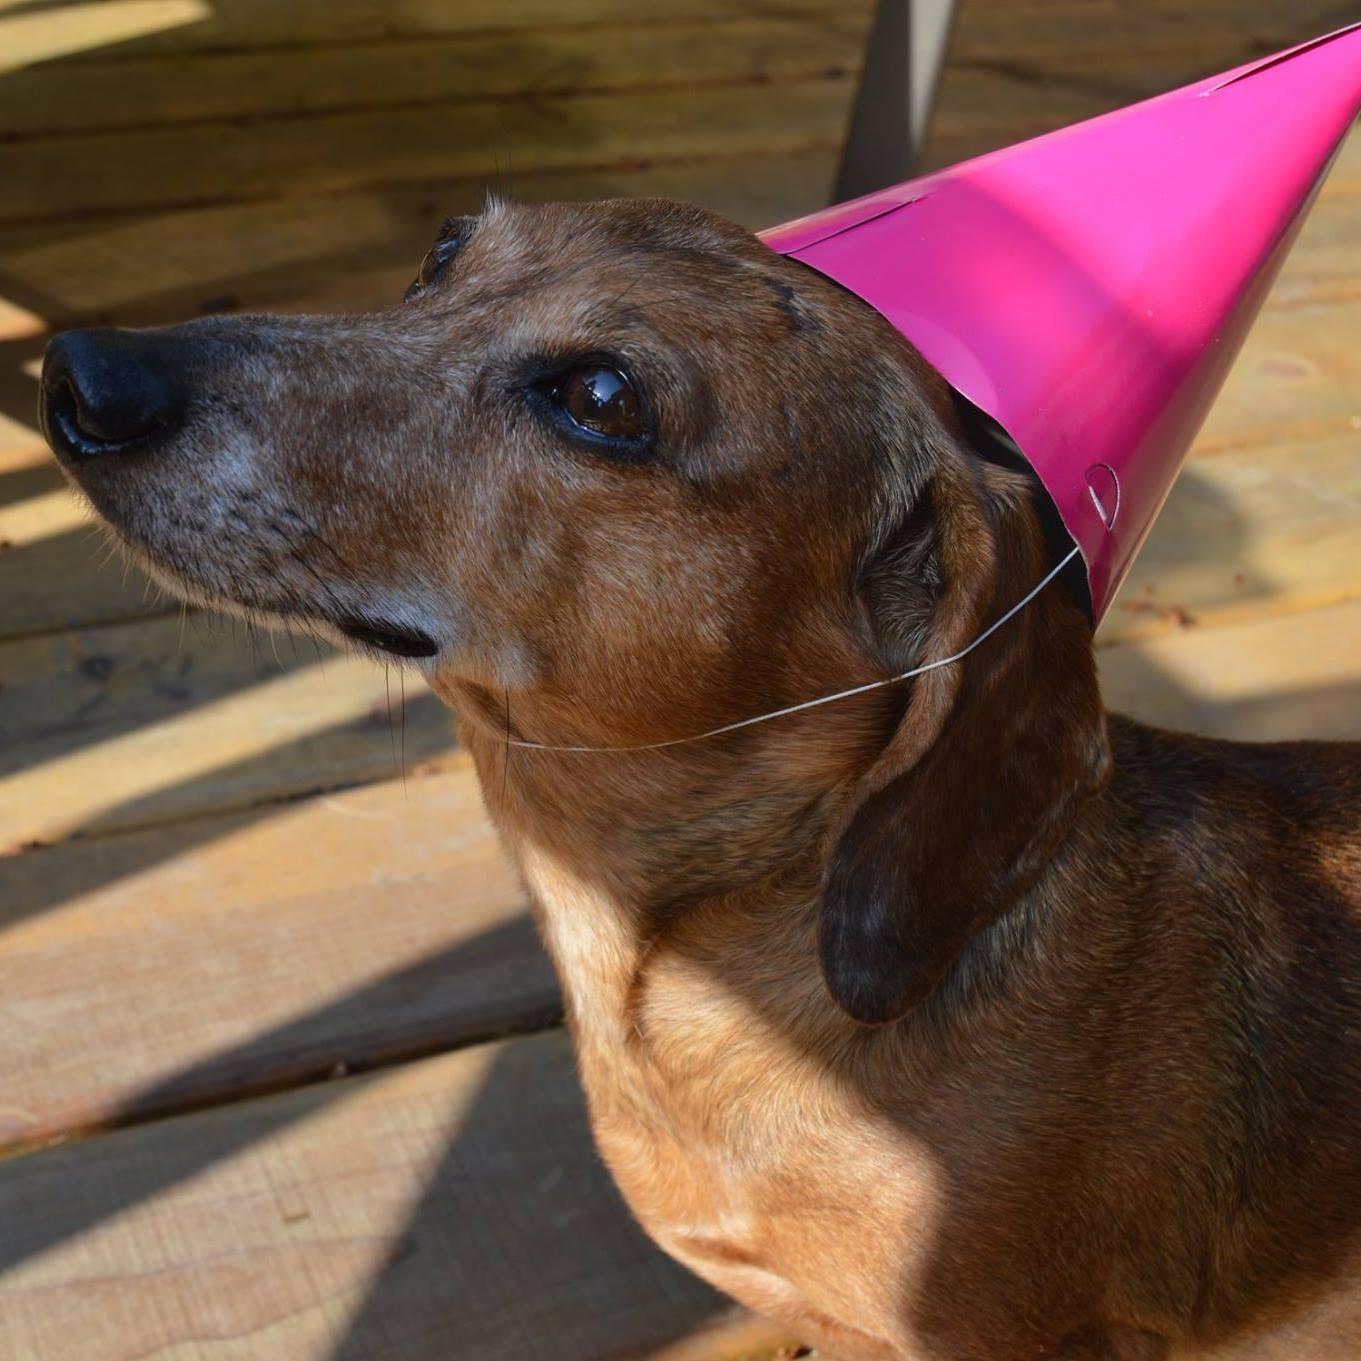 Bruiser celebrating his 12th birthday